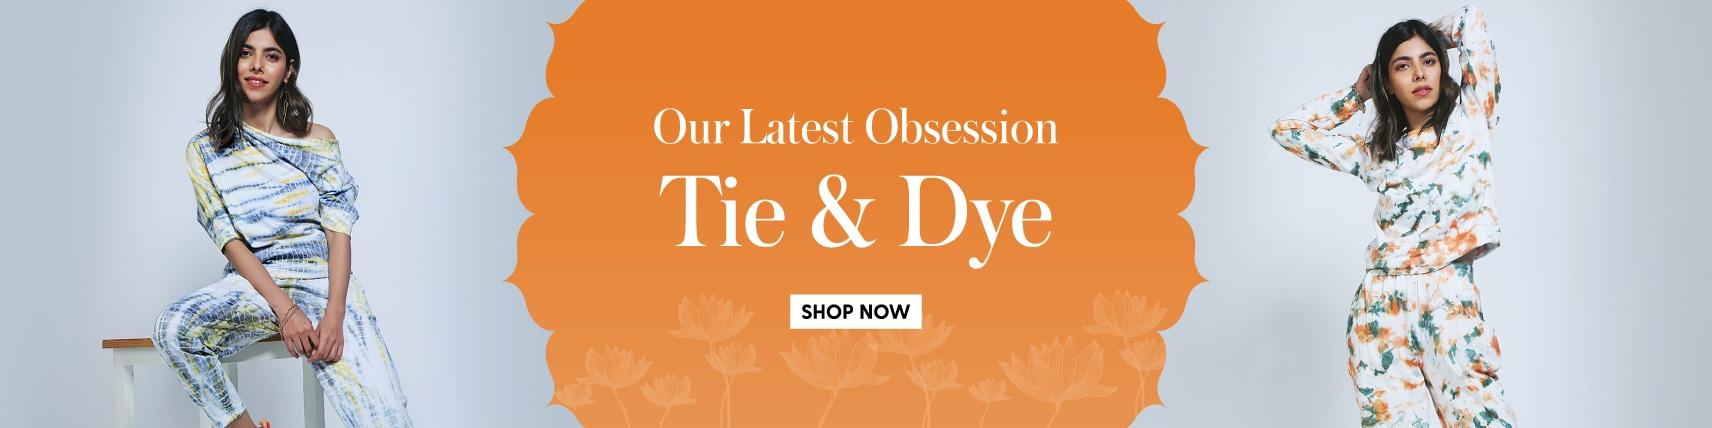 trends/tye-and-dye?utm_source=LandingPage&utm_medium=Banner&utm_campaign=TrendAlert-Tye-and-Dye